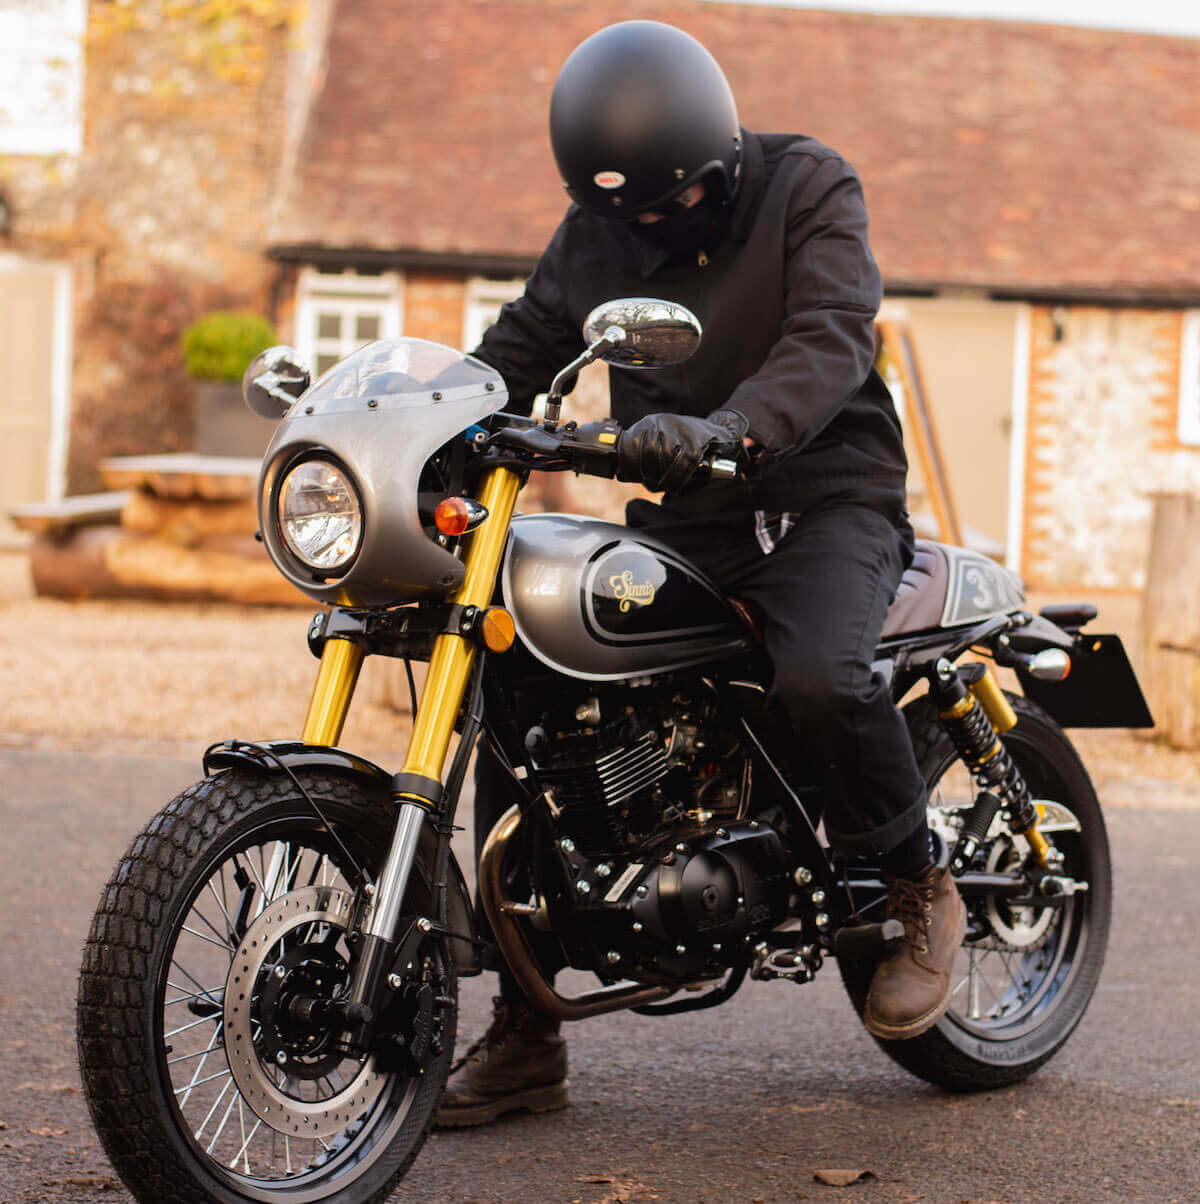 Sinnis bomber 125cc rider